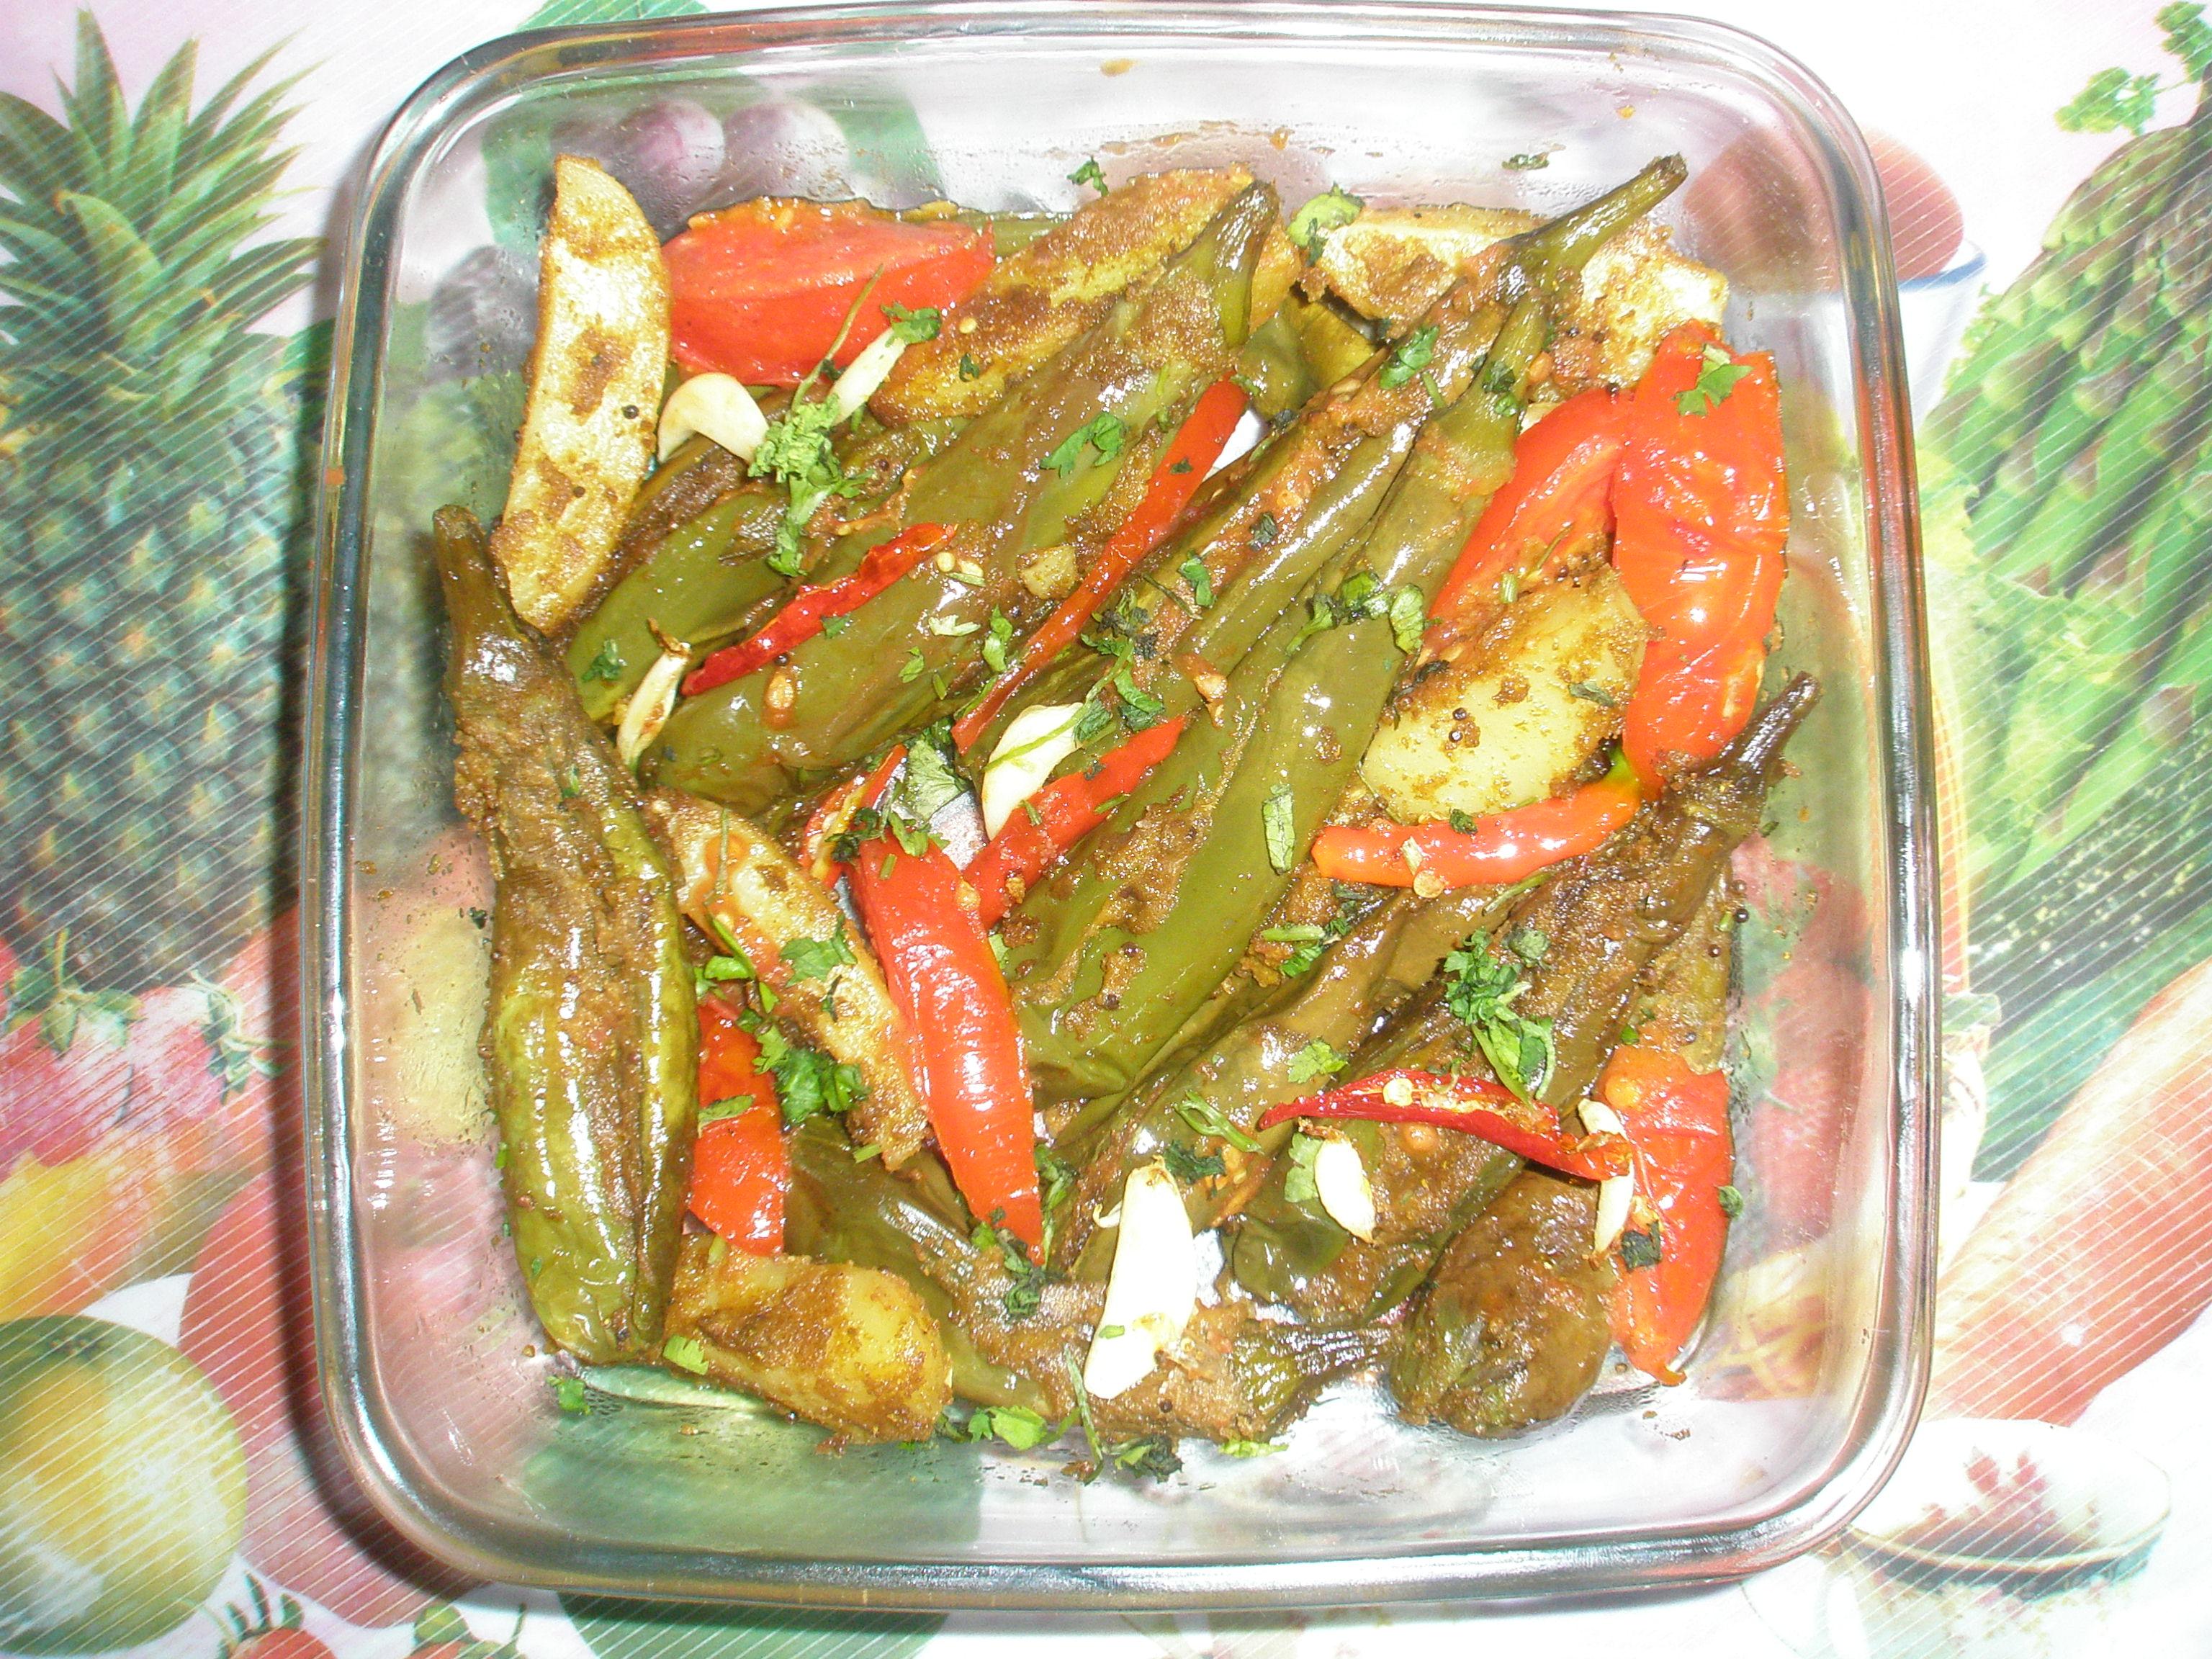 Bharwa Baigan (stuff brinjal) with potato (without onion and garlic)